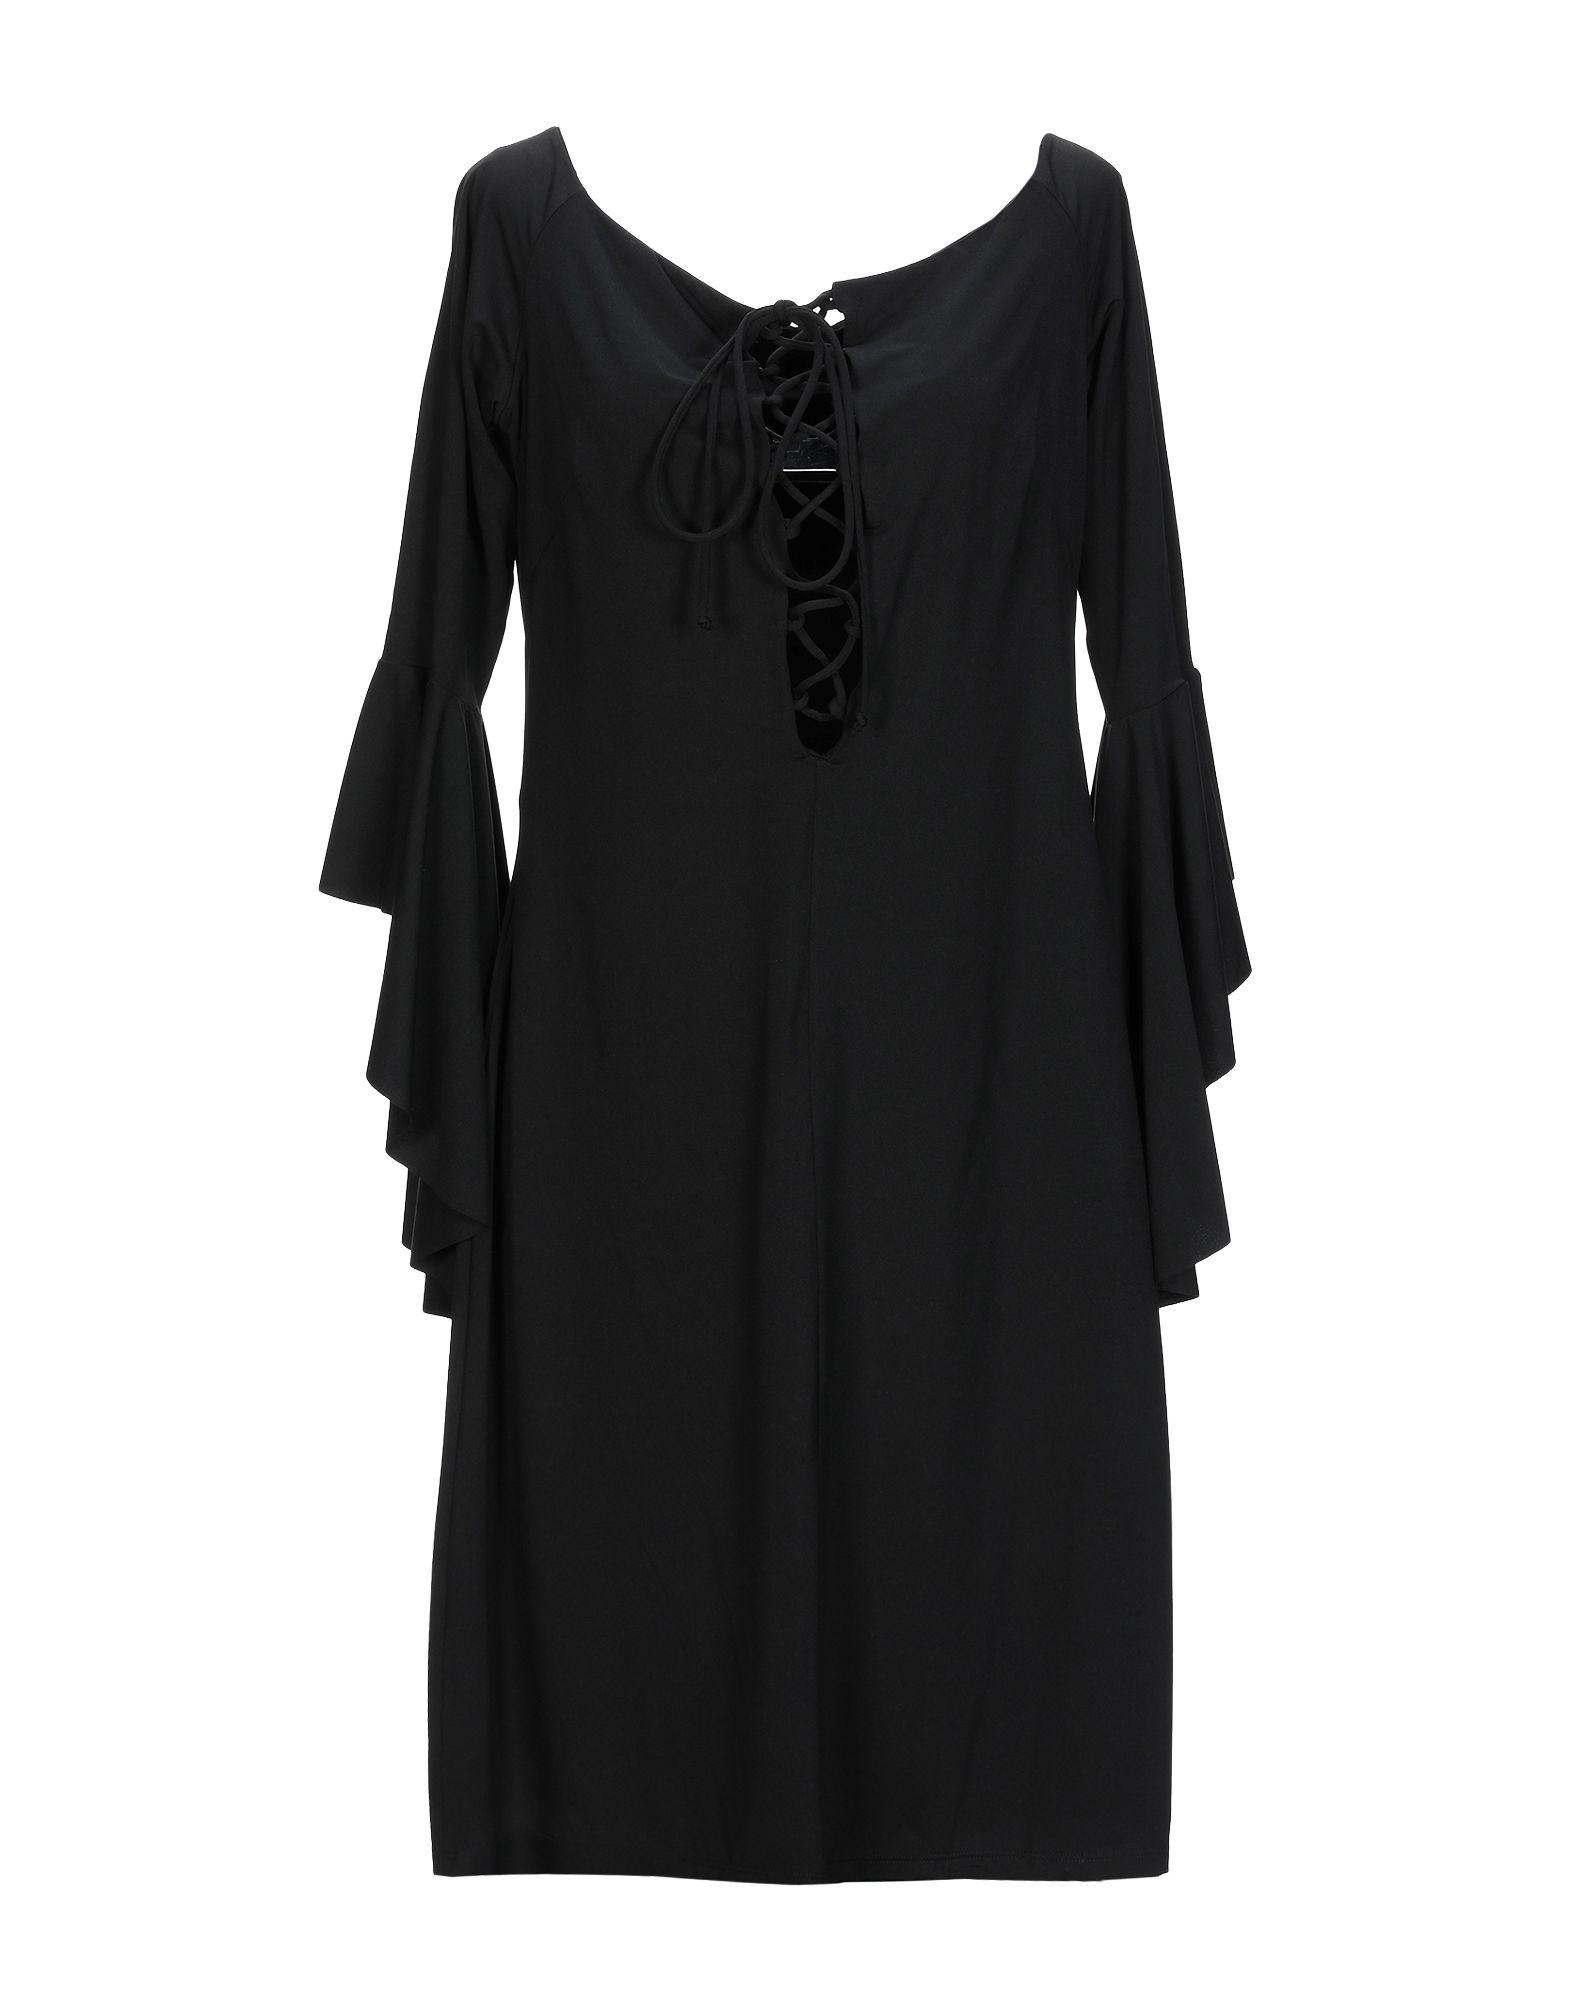 Robe Fisico Courtes Sur 34920488gq Courte Yoox Robes Femme xp1xTPwHq